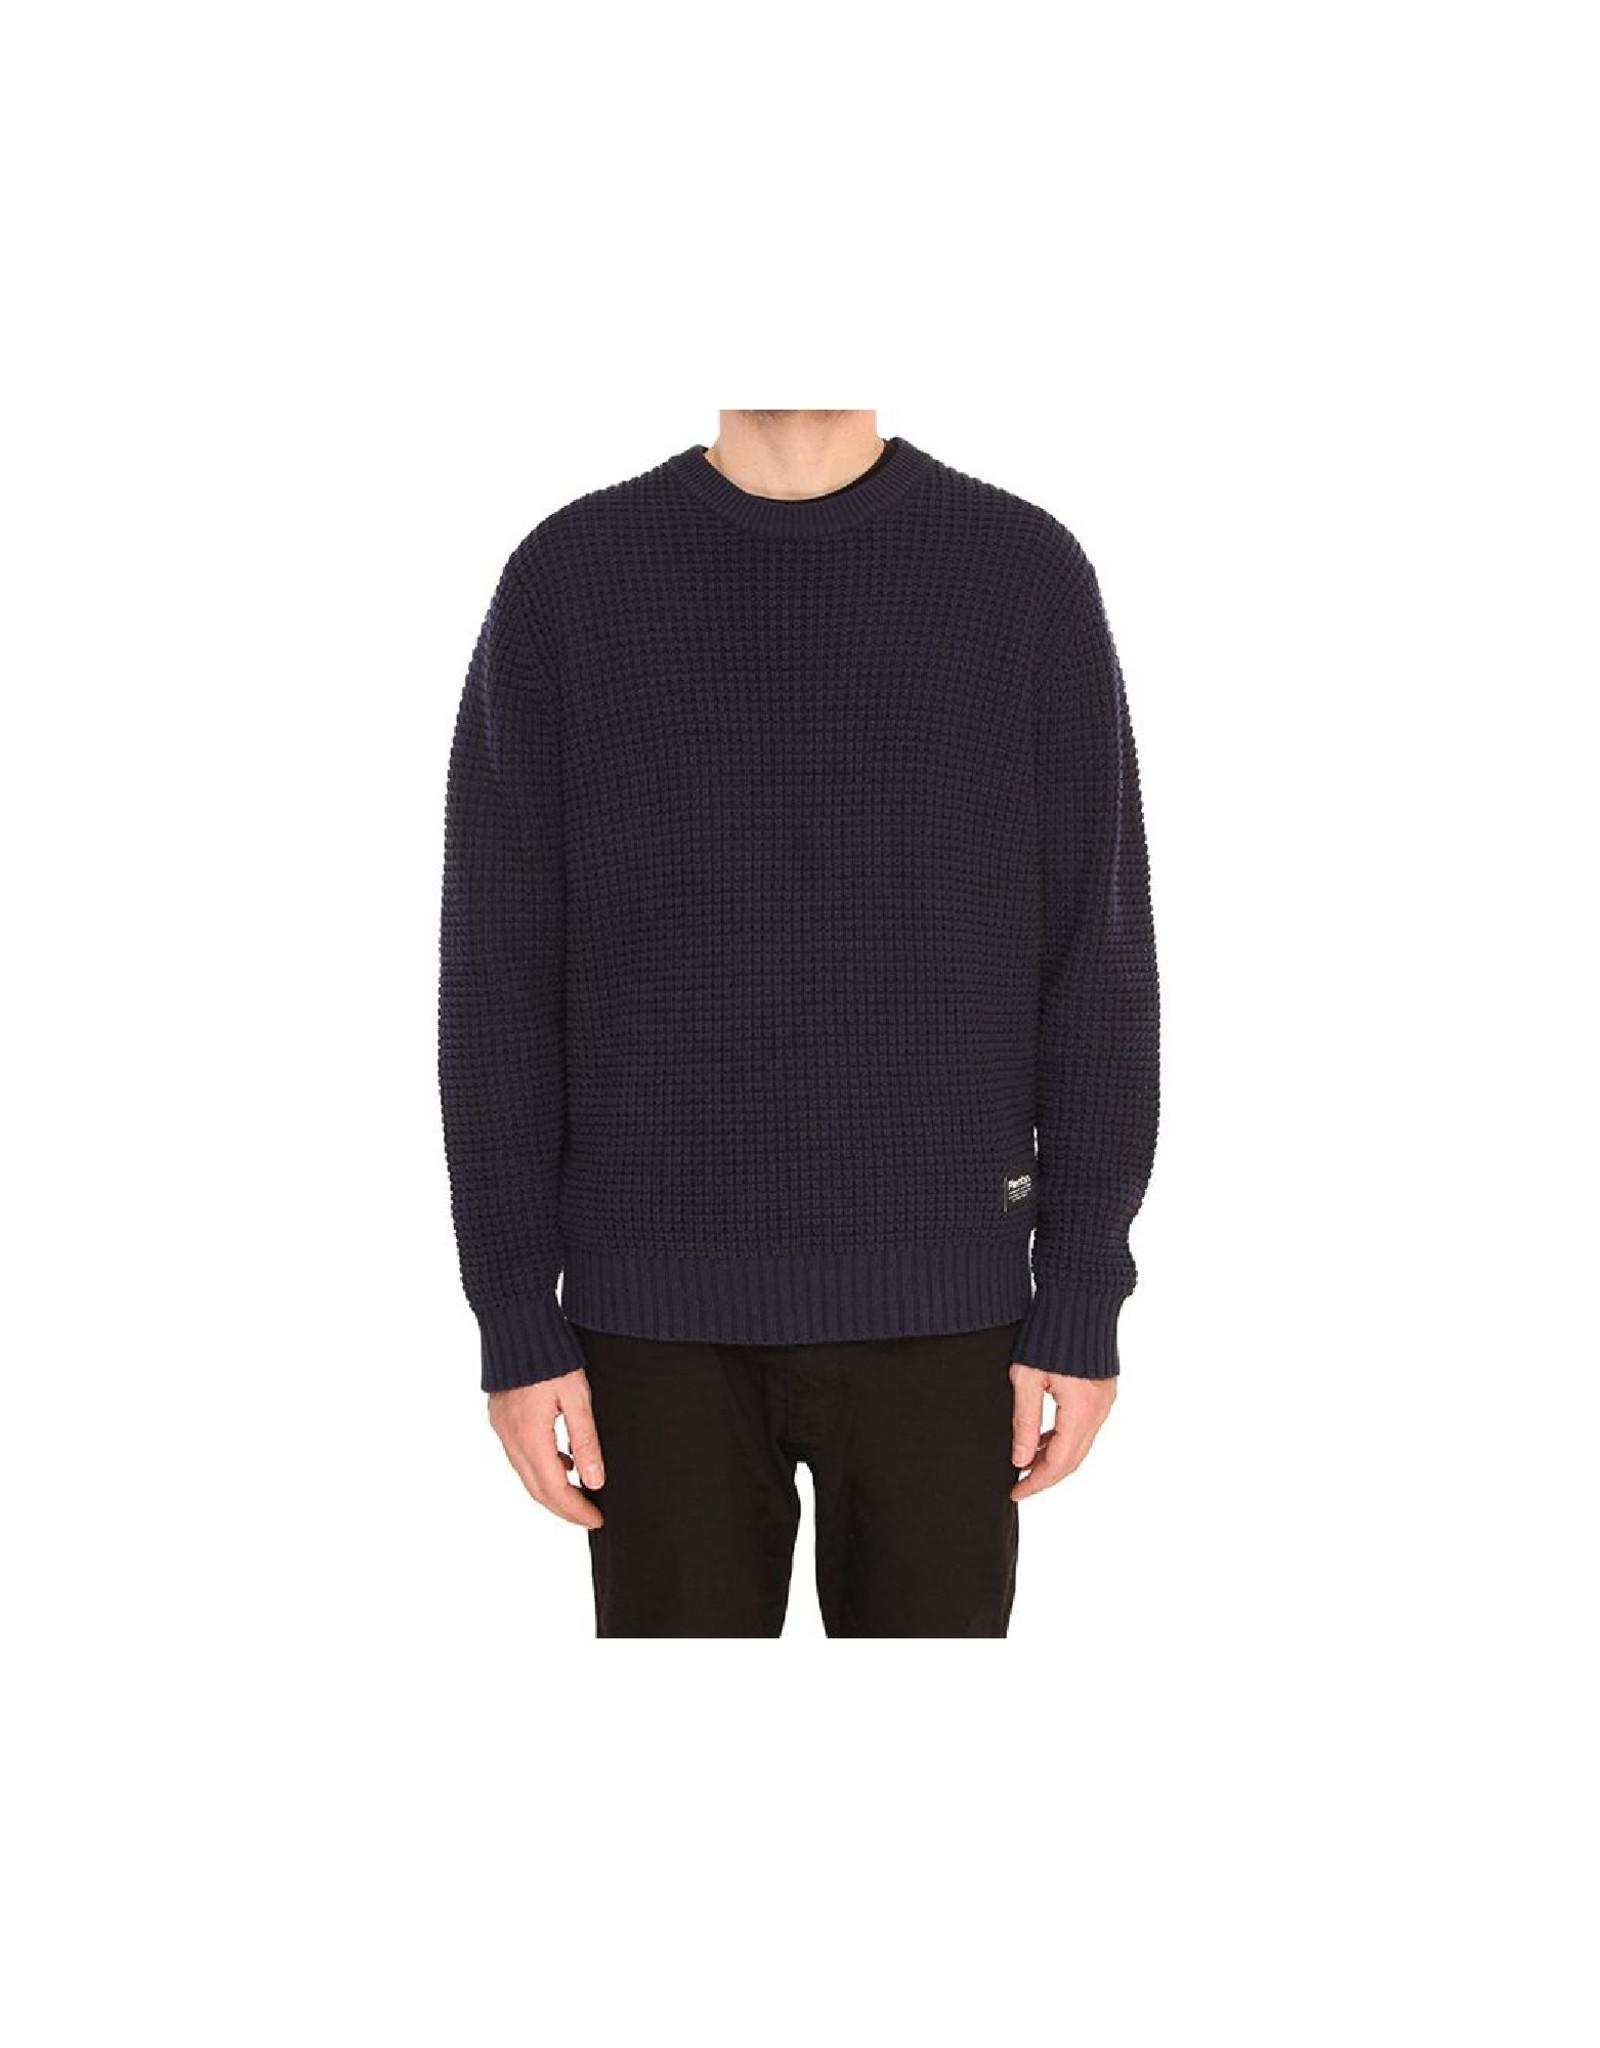 Plenty Berkin Sweater